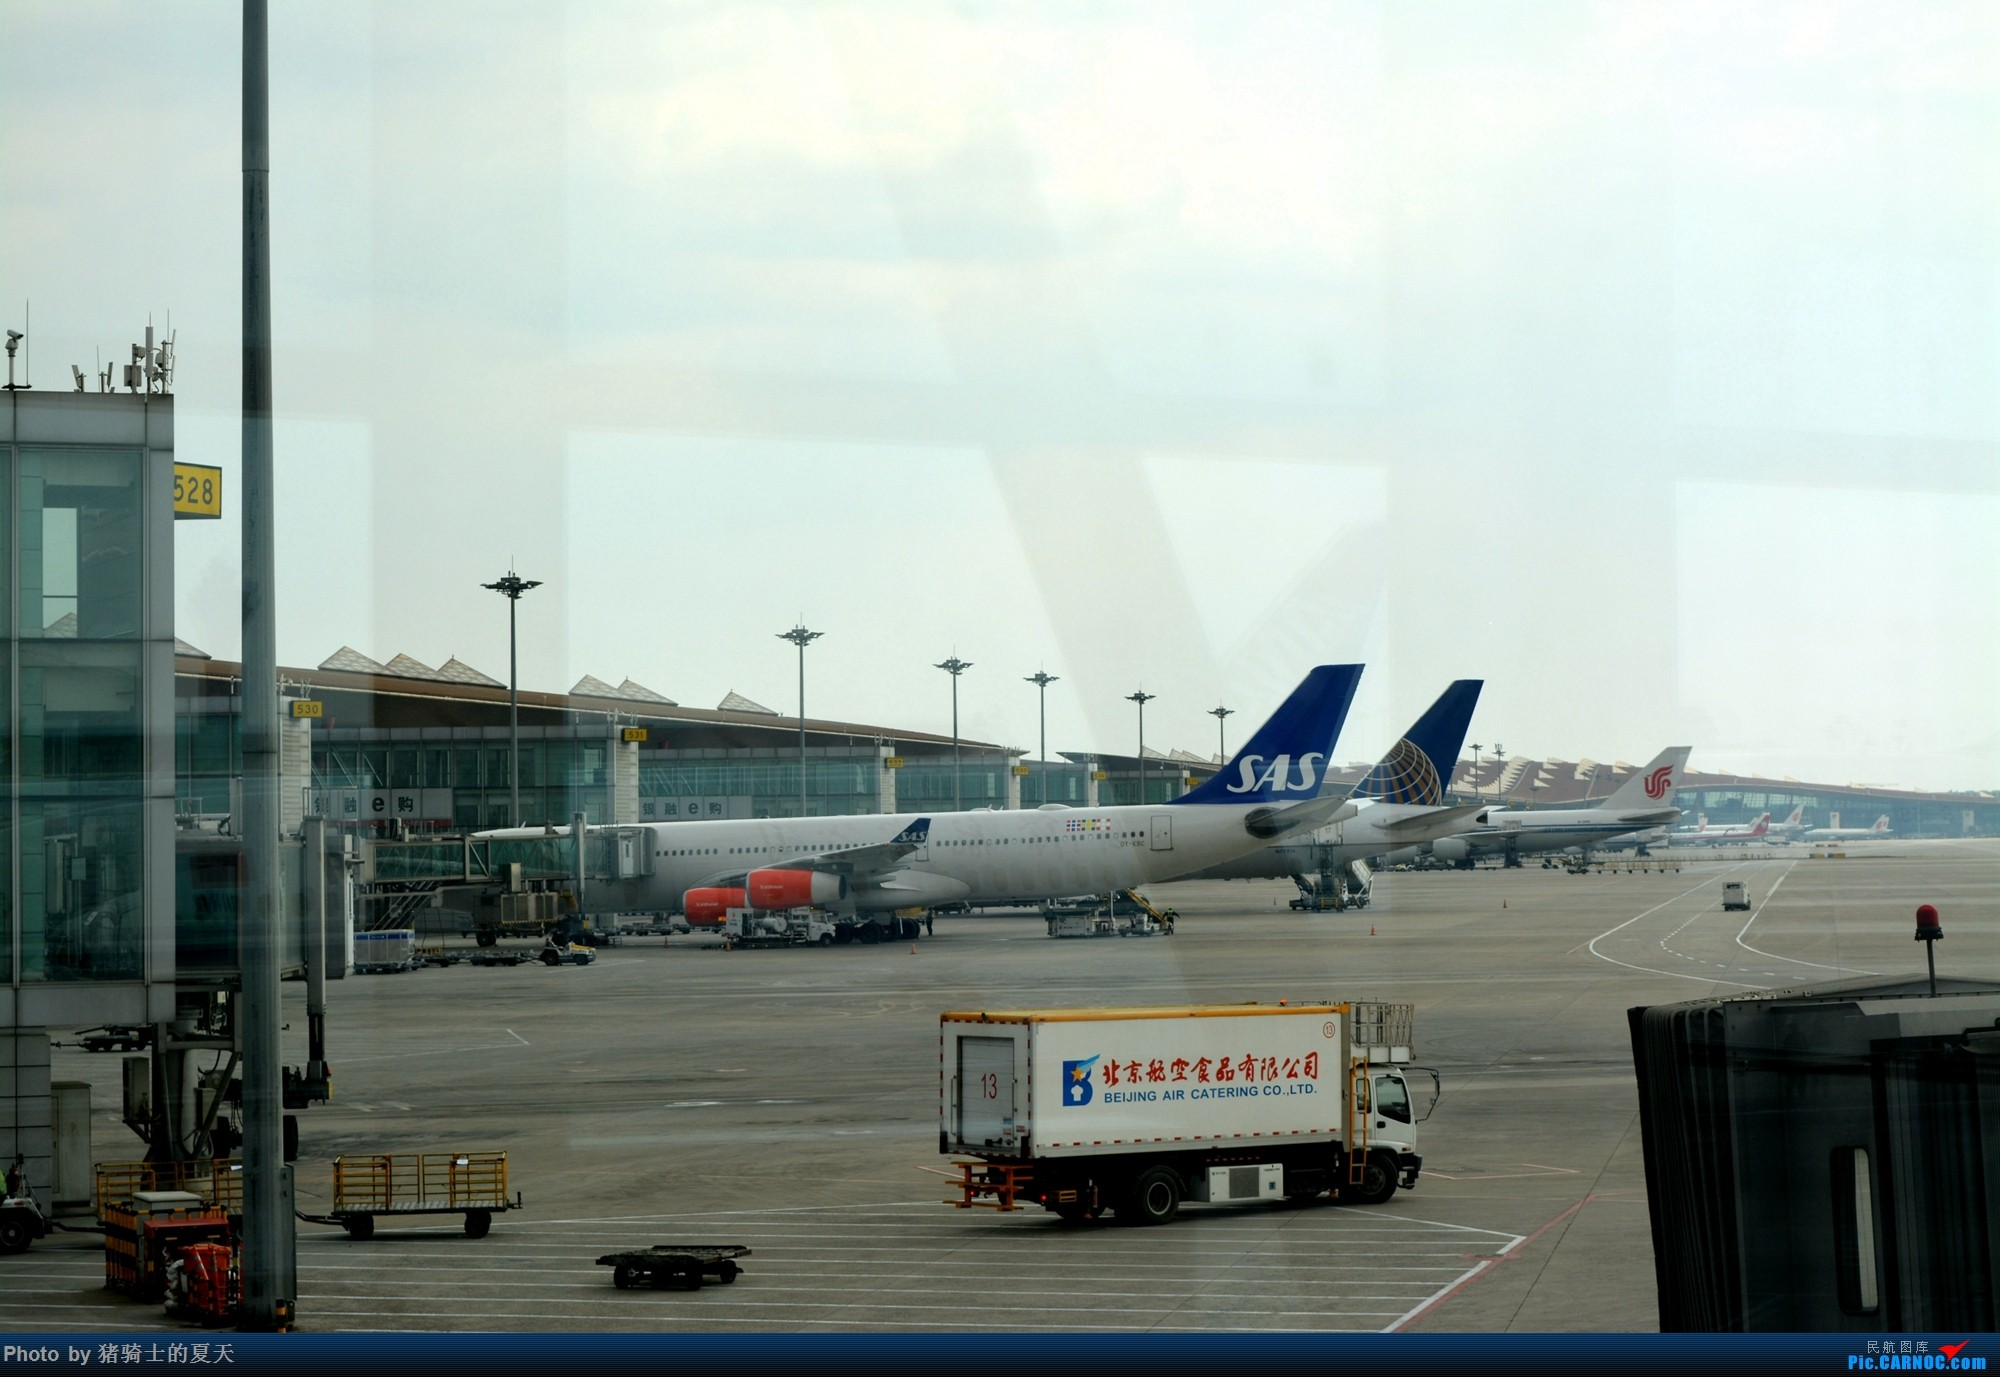 Re:2017年鸡鸭图 AIRBUS A340  中国北京首都国际机场